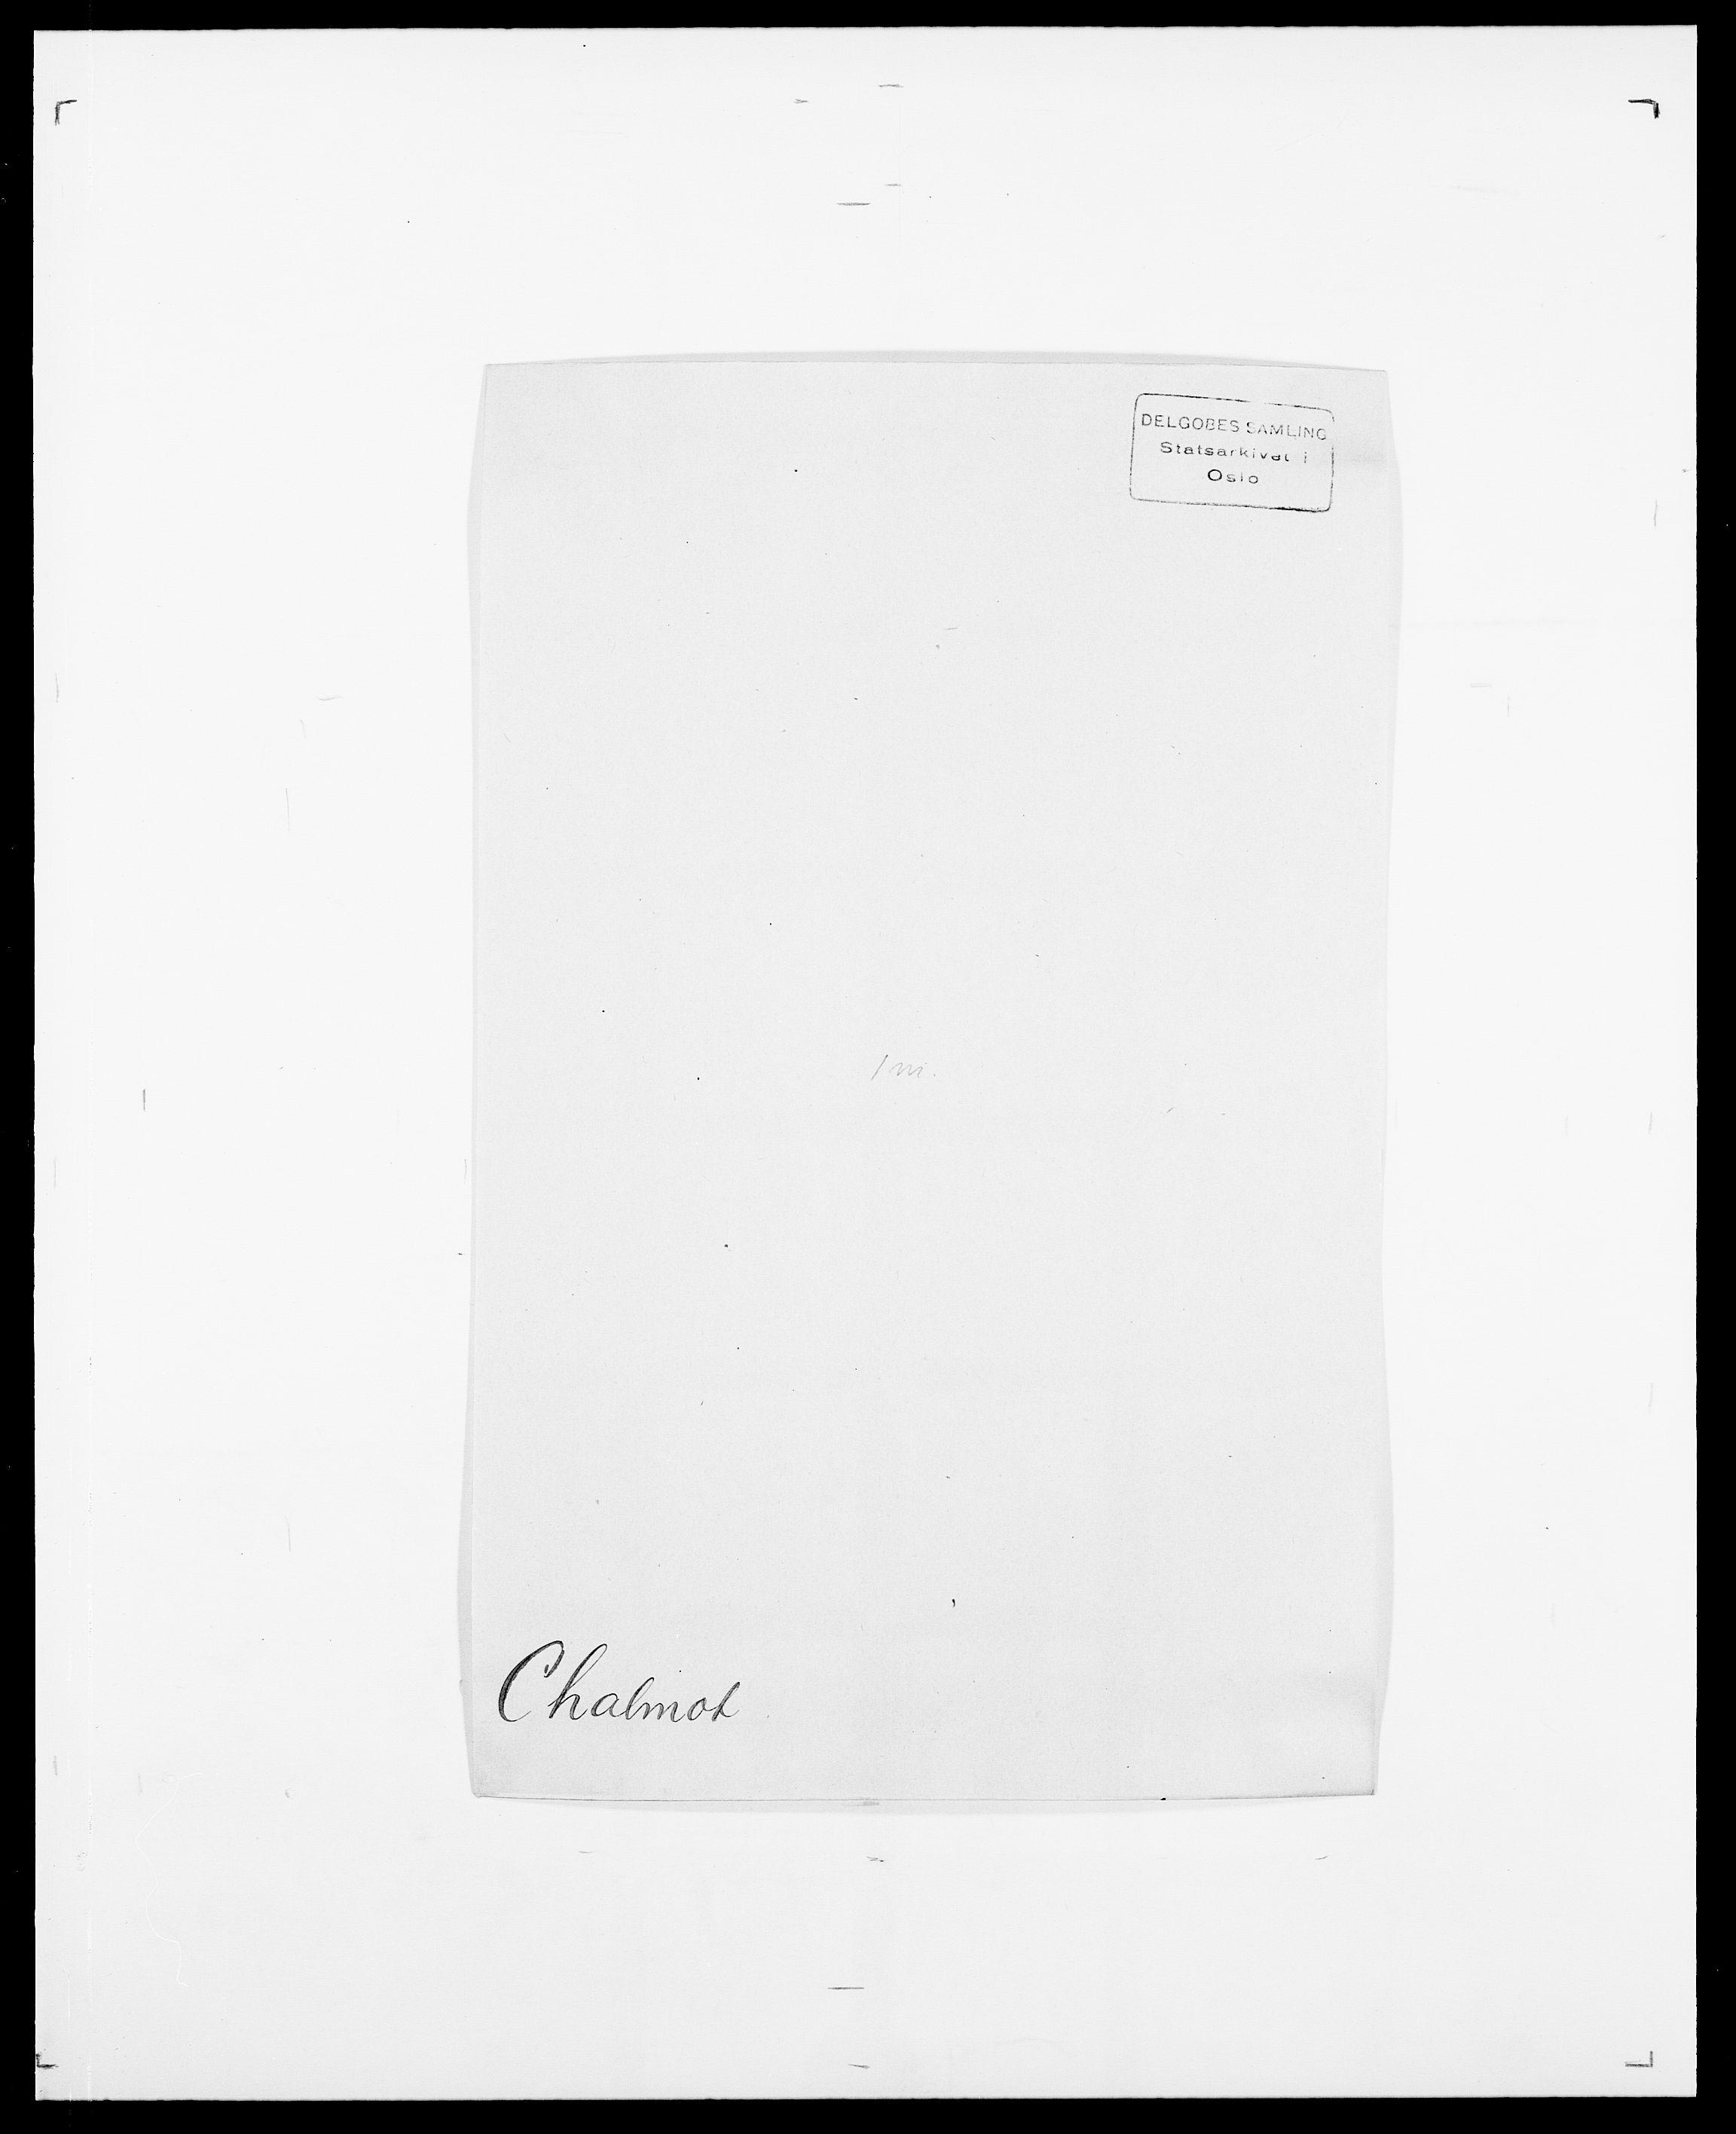 SAO, Delgobe, Charles Antoine - samling, D/Da/L0008: Capjon - Dagenbolt, s. 167